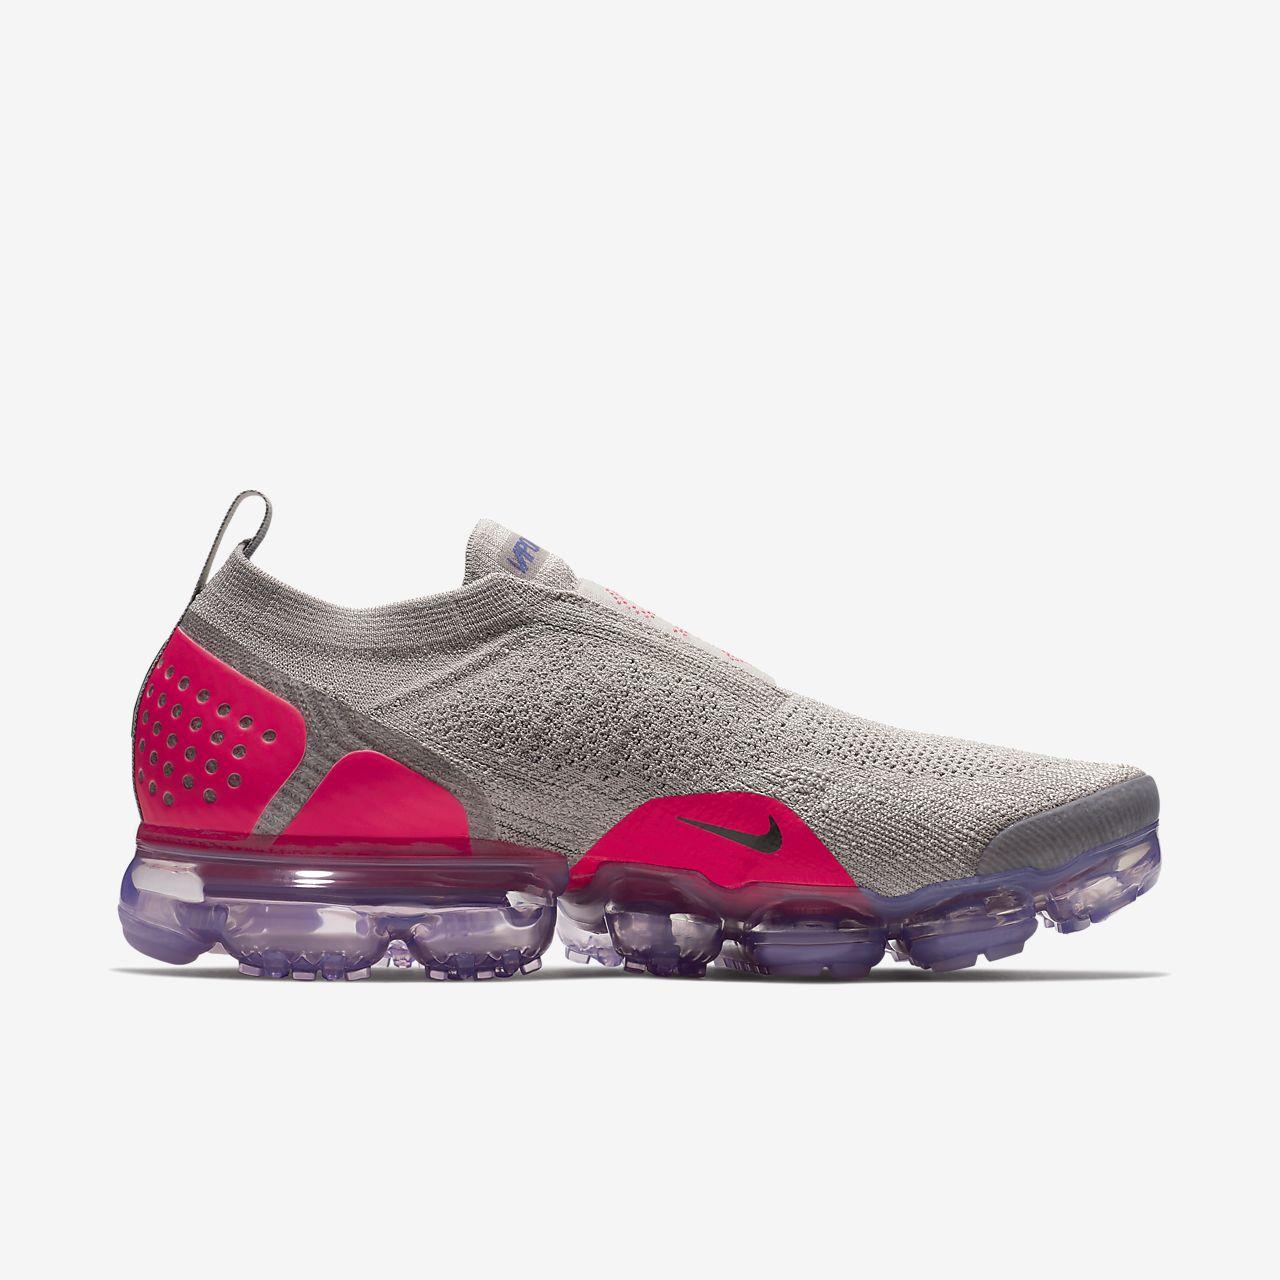 pretty nice 0de17 9156a Nike Air VaporMax Flyknit Moc 2 Shoe